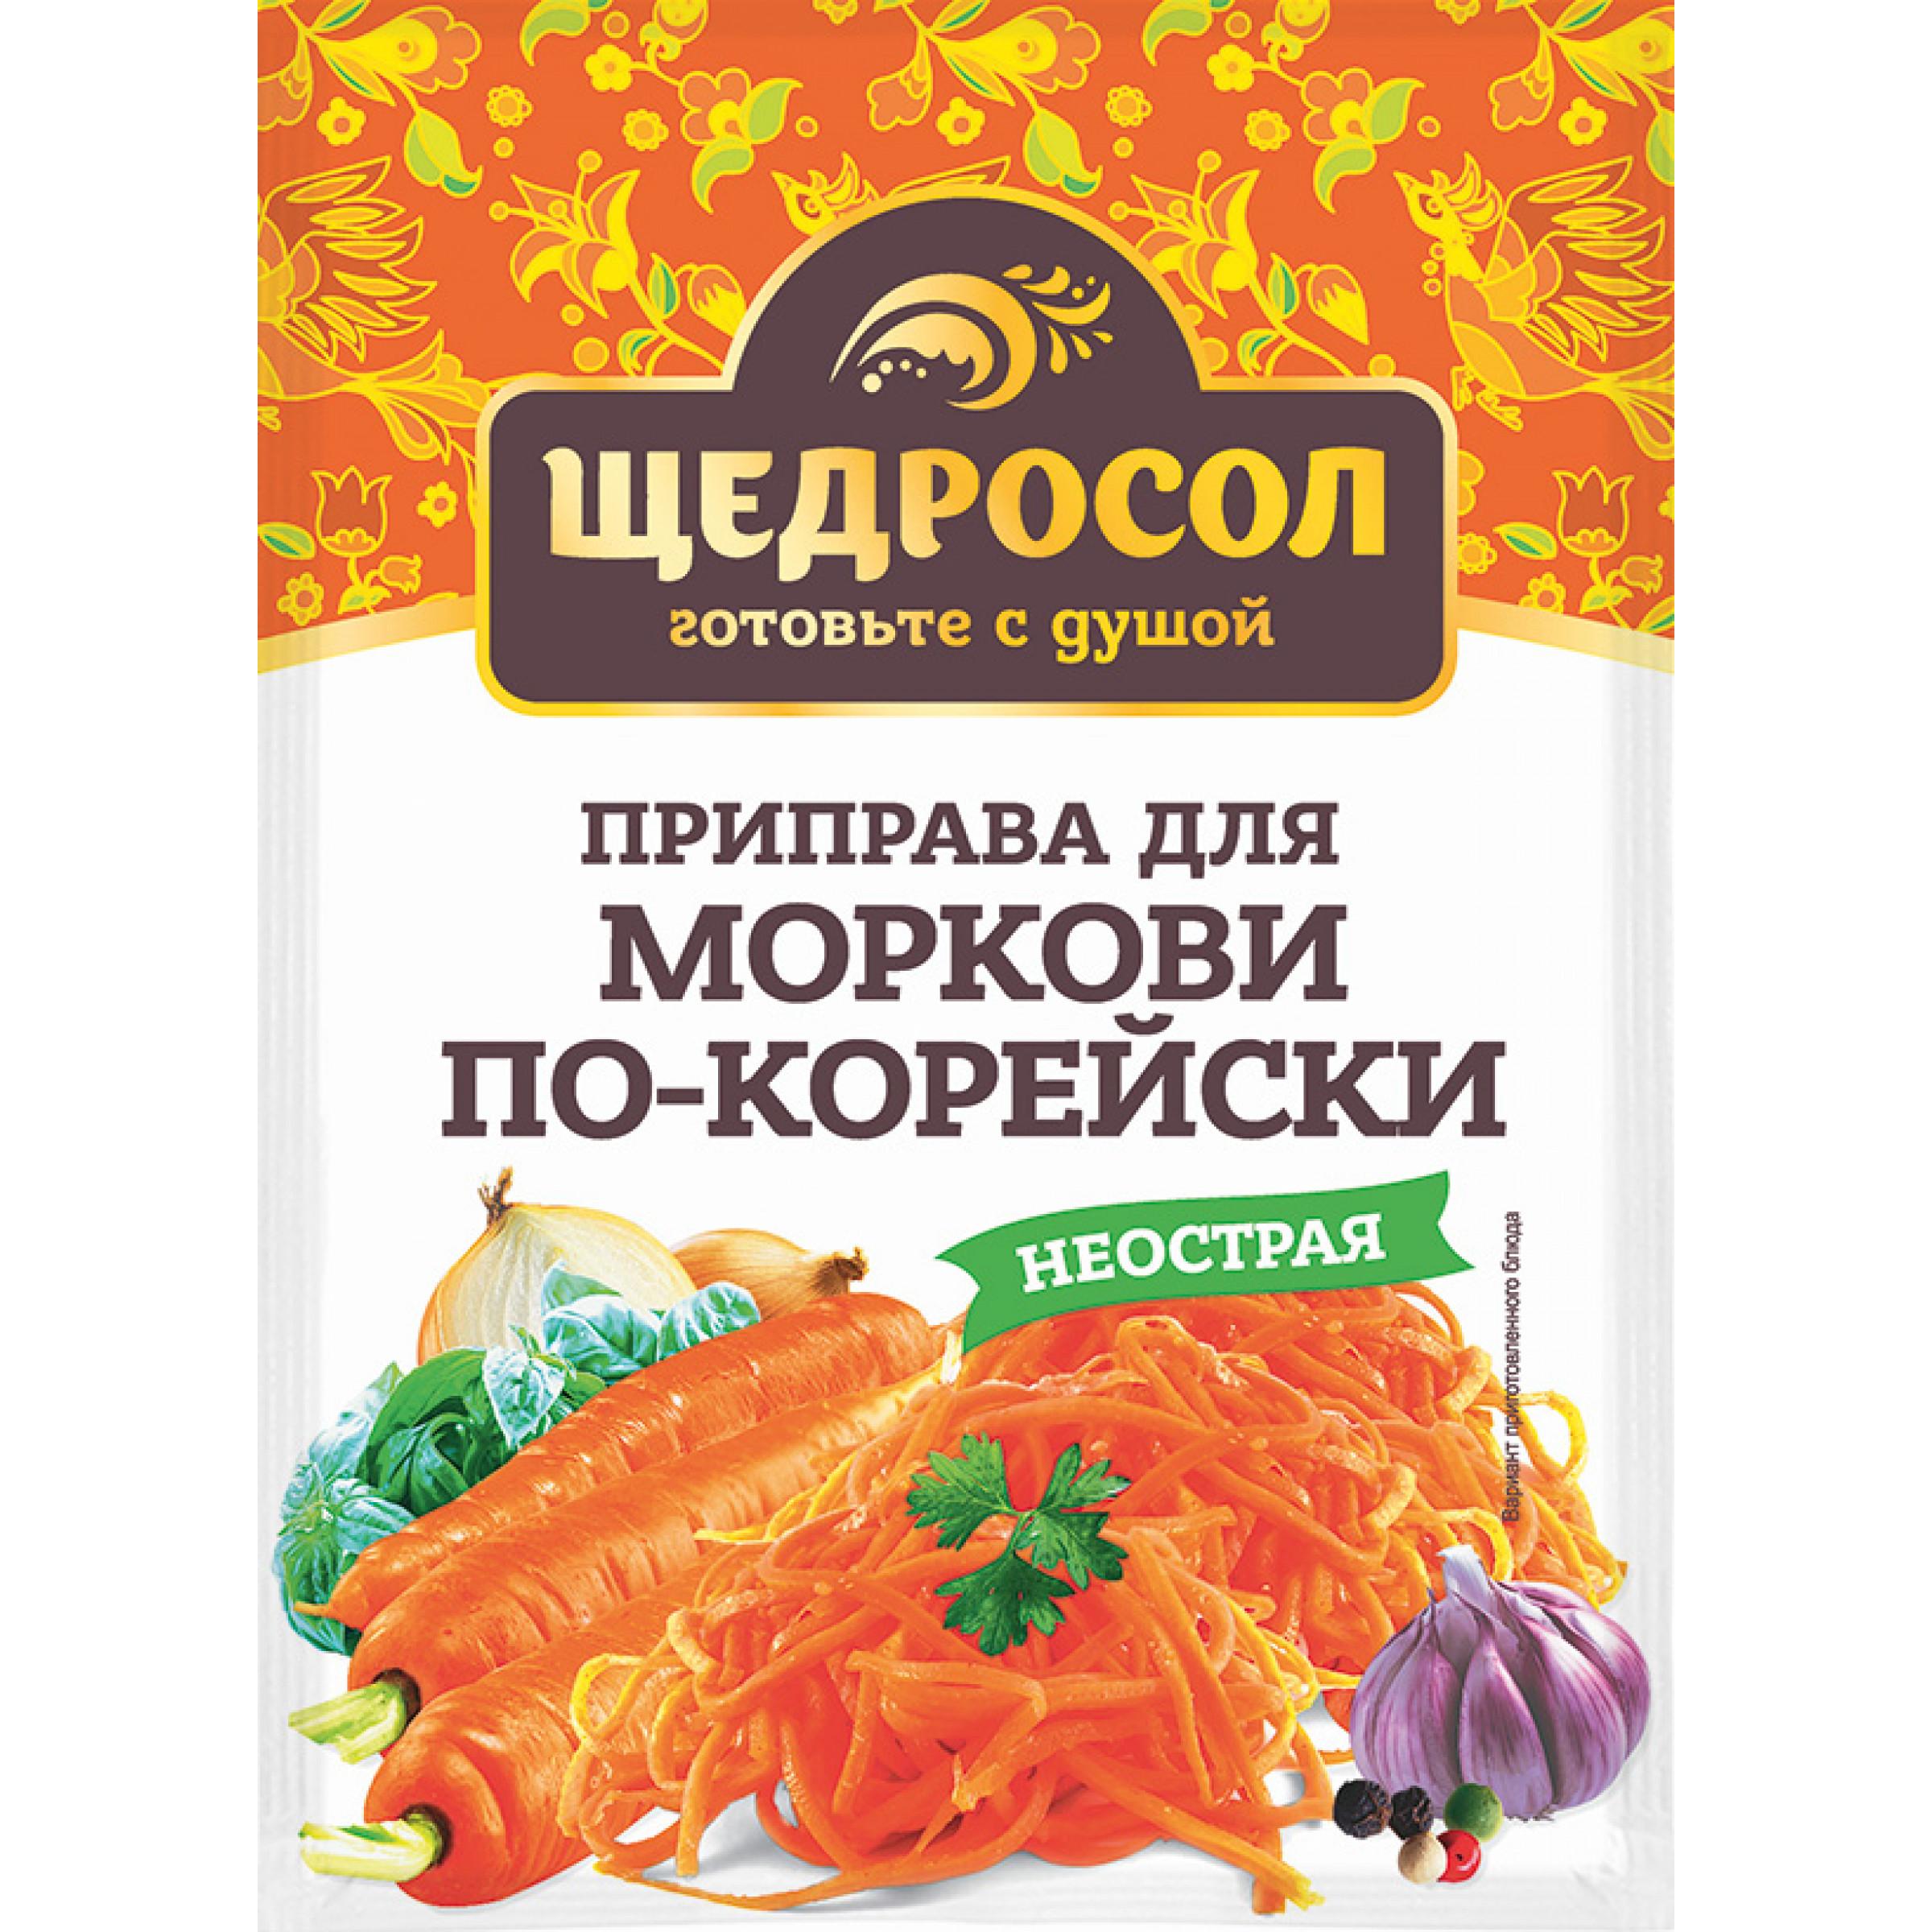 Приправа для моркови по-корейски, Щедросол, 15 гр